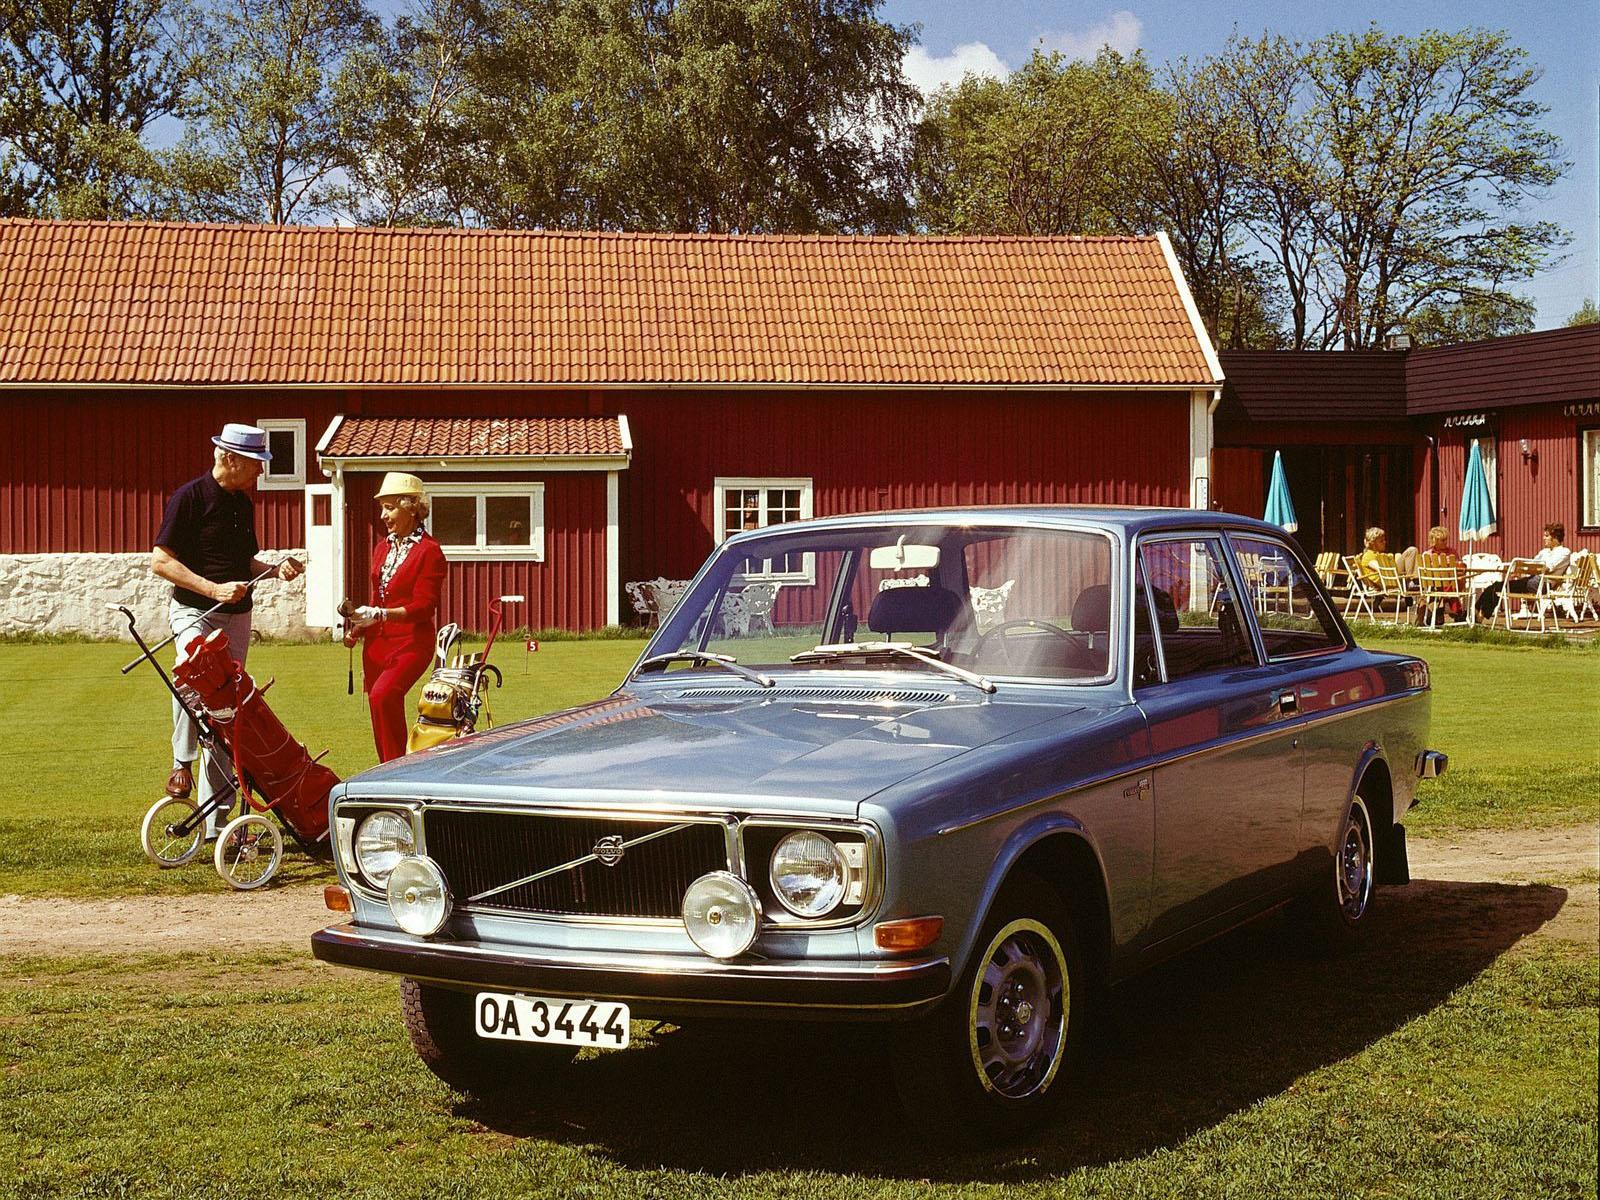 Volvo 164 Engine Diagram Schematics 2001 S40 Car Interior Design 1968 1974 Sedan Outstanding Cars Ford Cortina